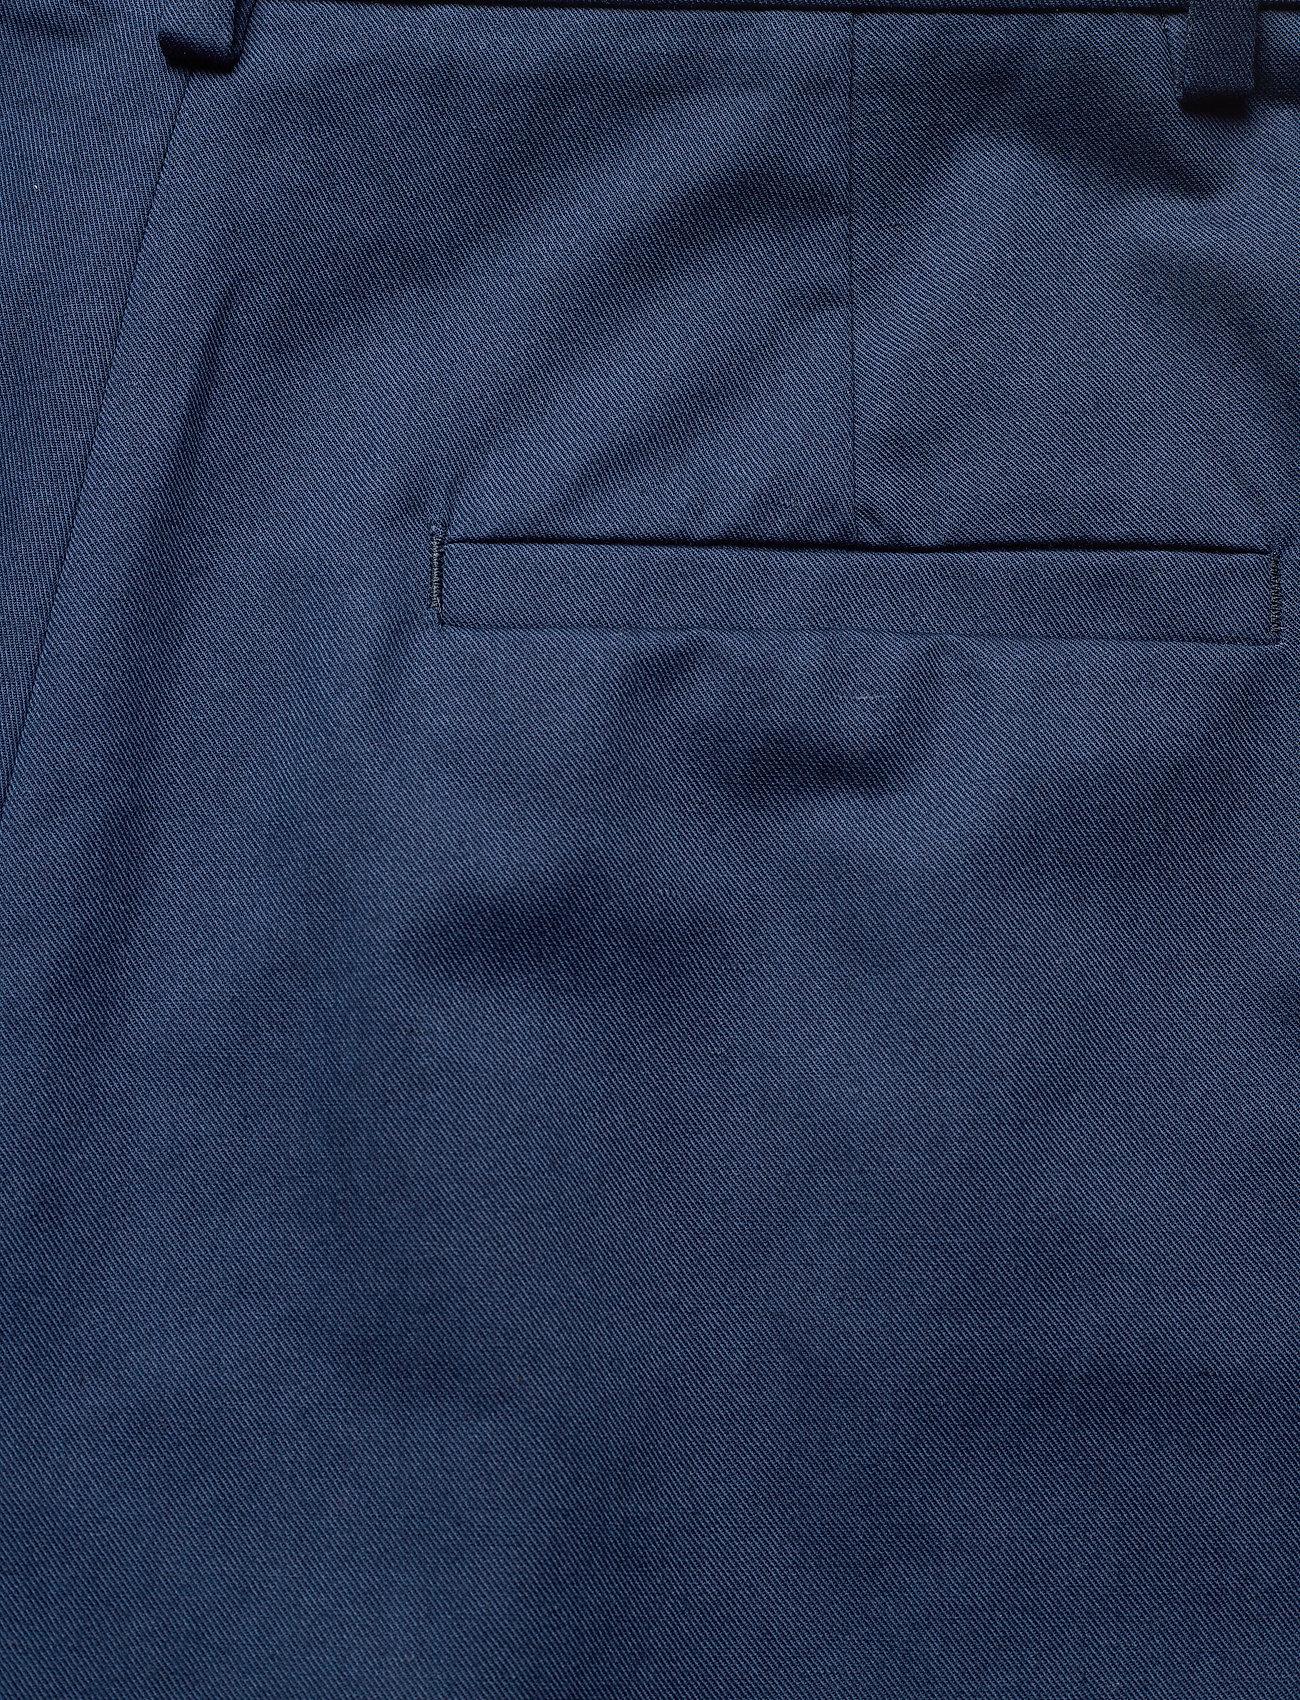 Weekend Max Mara - VISINO - casual korte broeken - ultramarine - 4